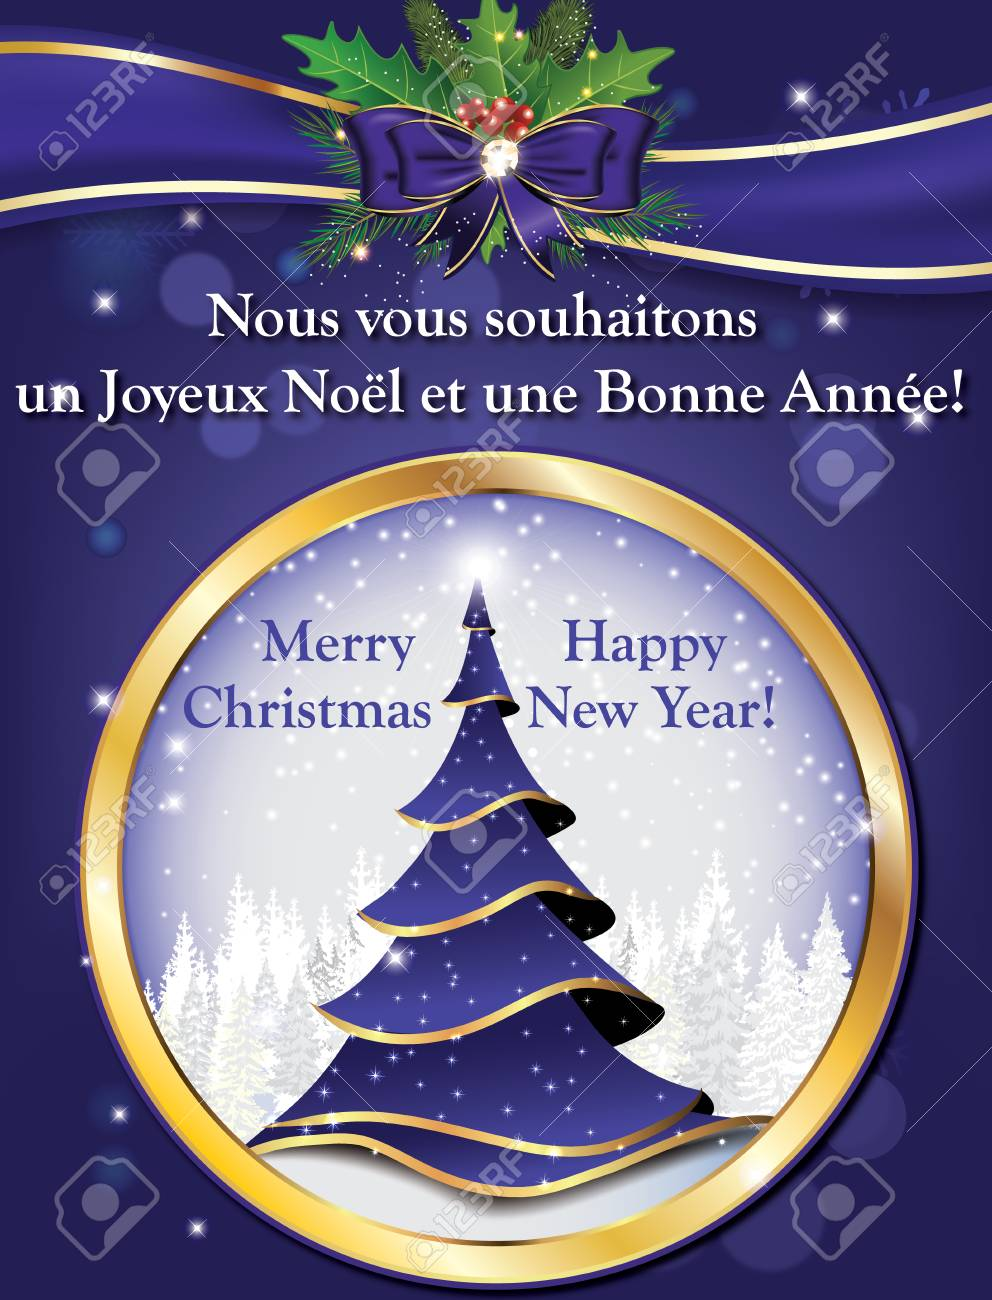 Frasi Di Natale In Francese.Buon Natale Traduzione Francese Frismarketingadvies